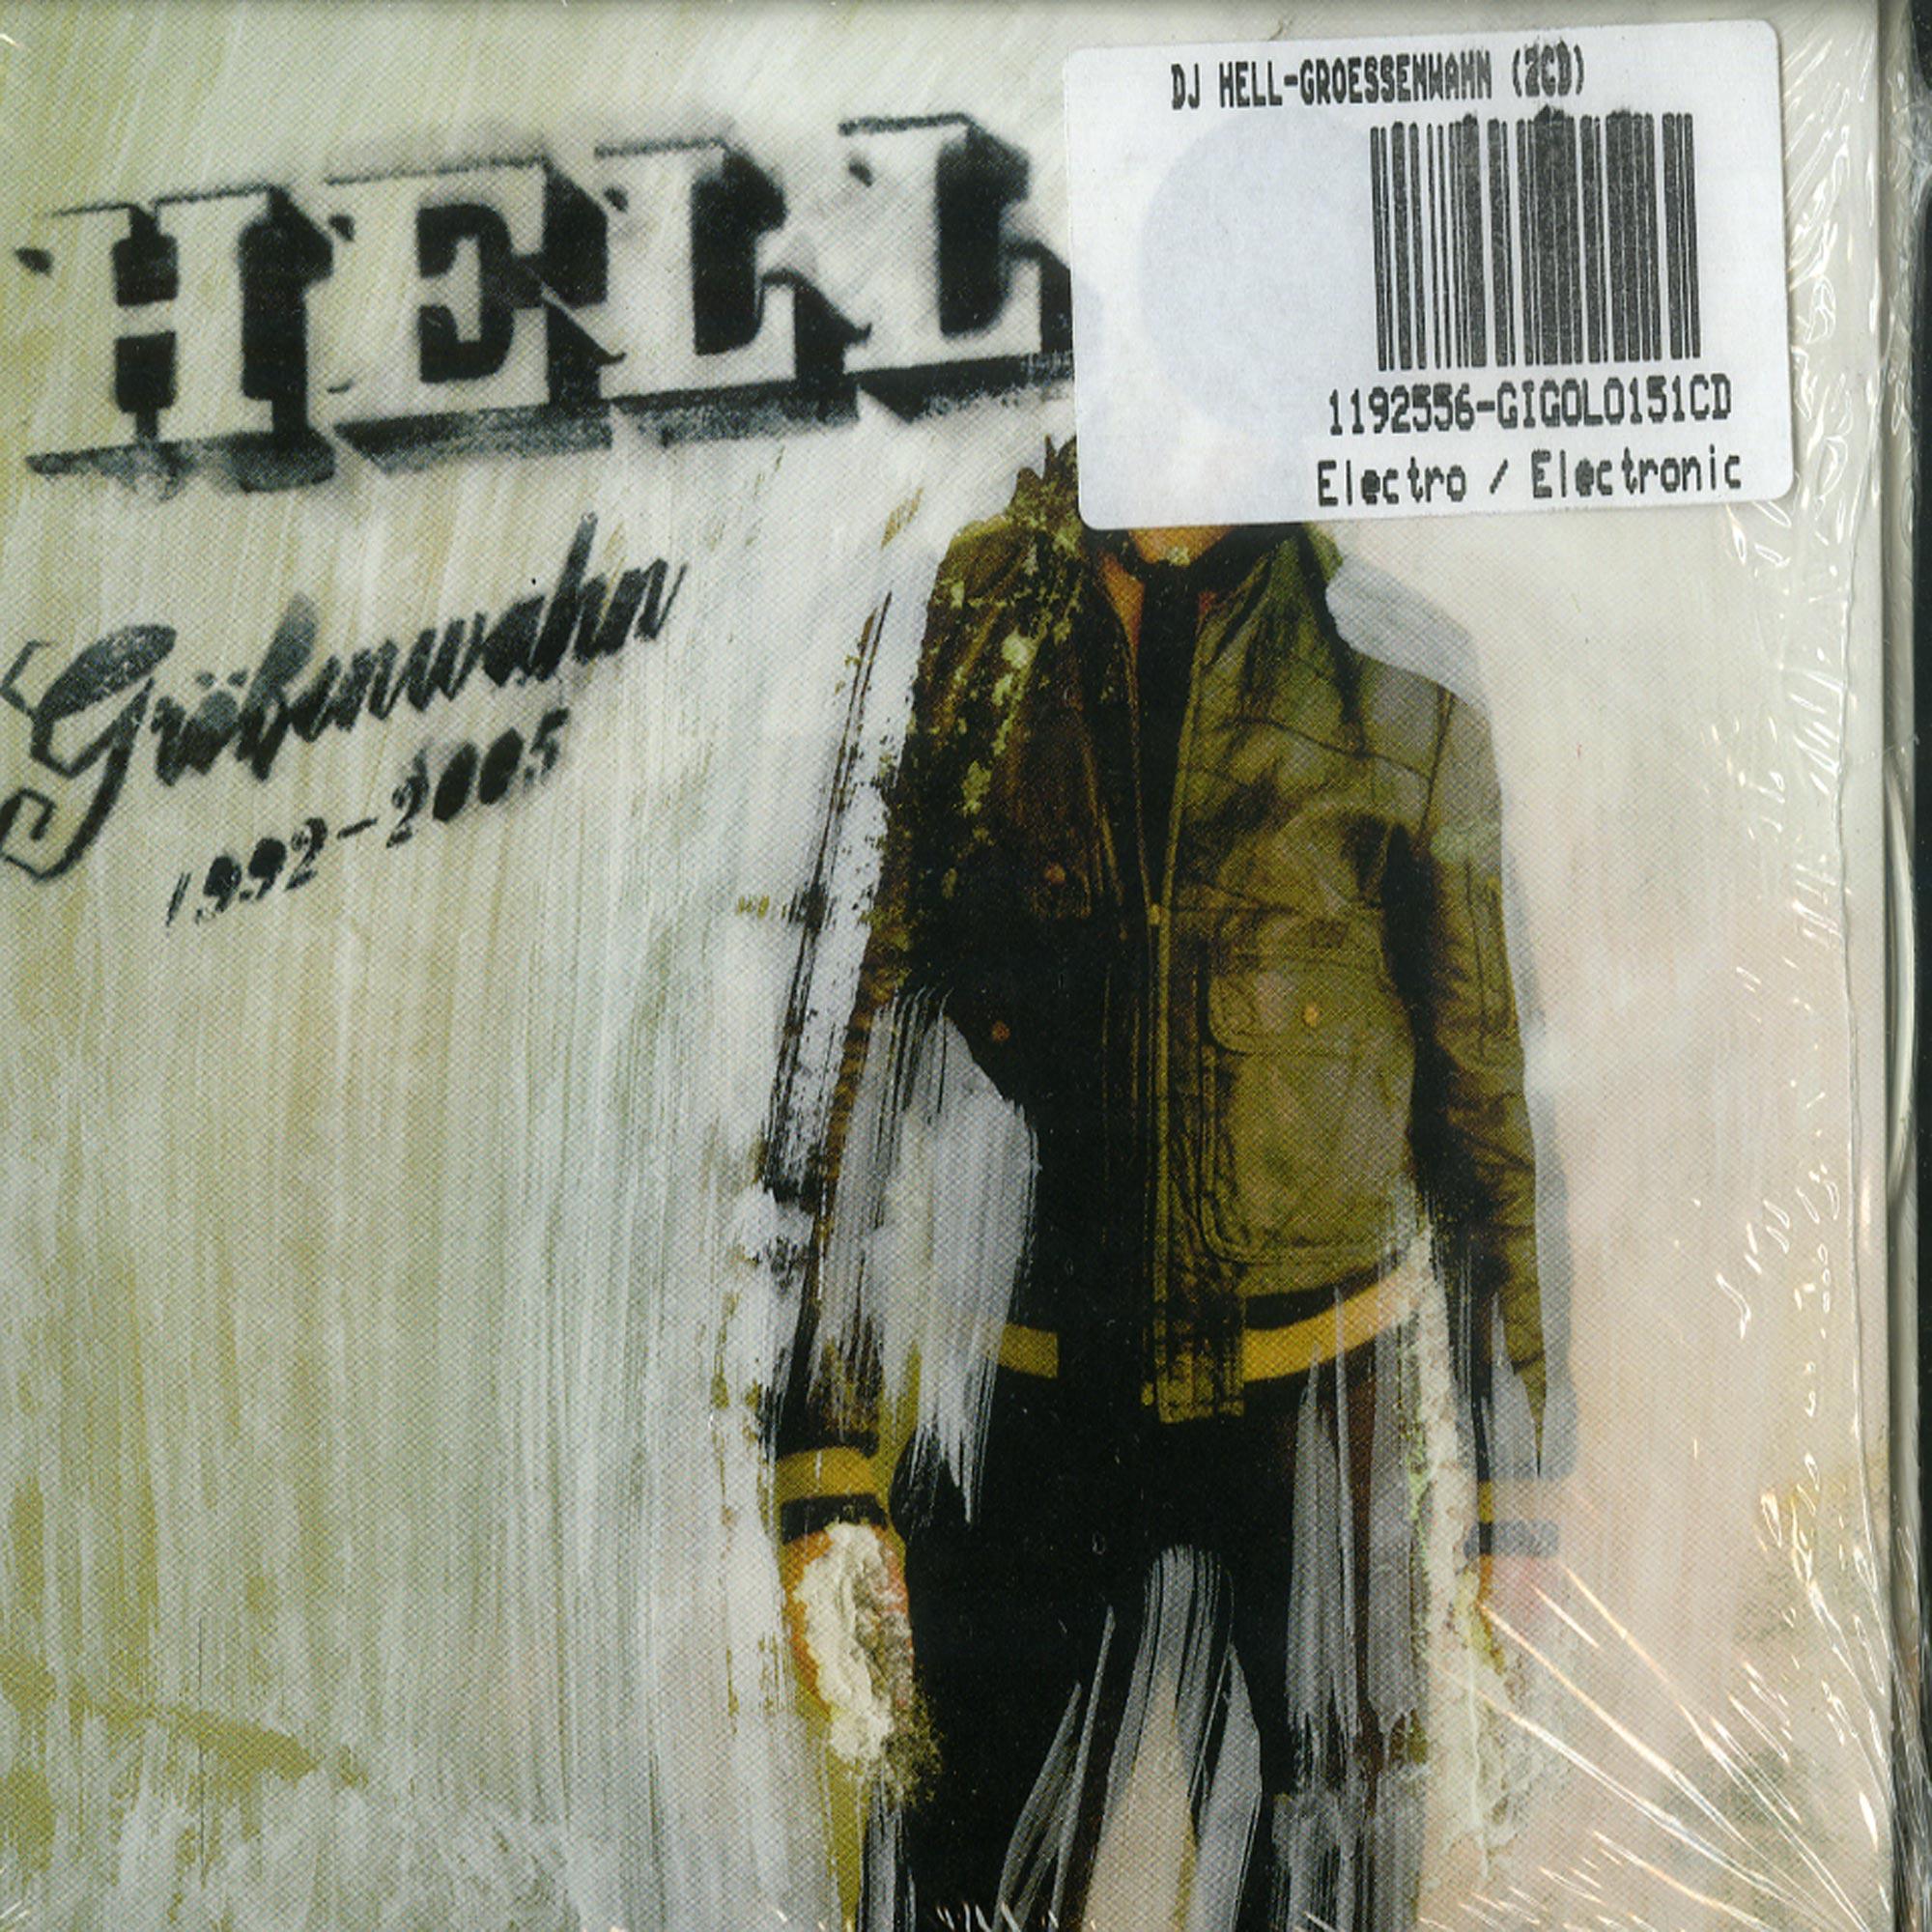 DJ Hell - GROESSENWAHN 92-05 / MONOTONIE DURCH AUTOMATION